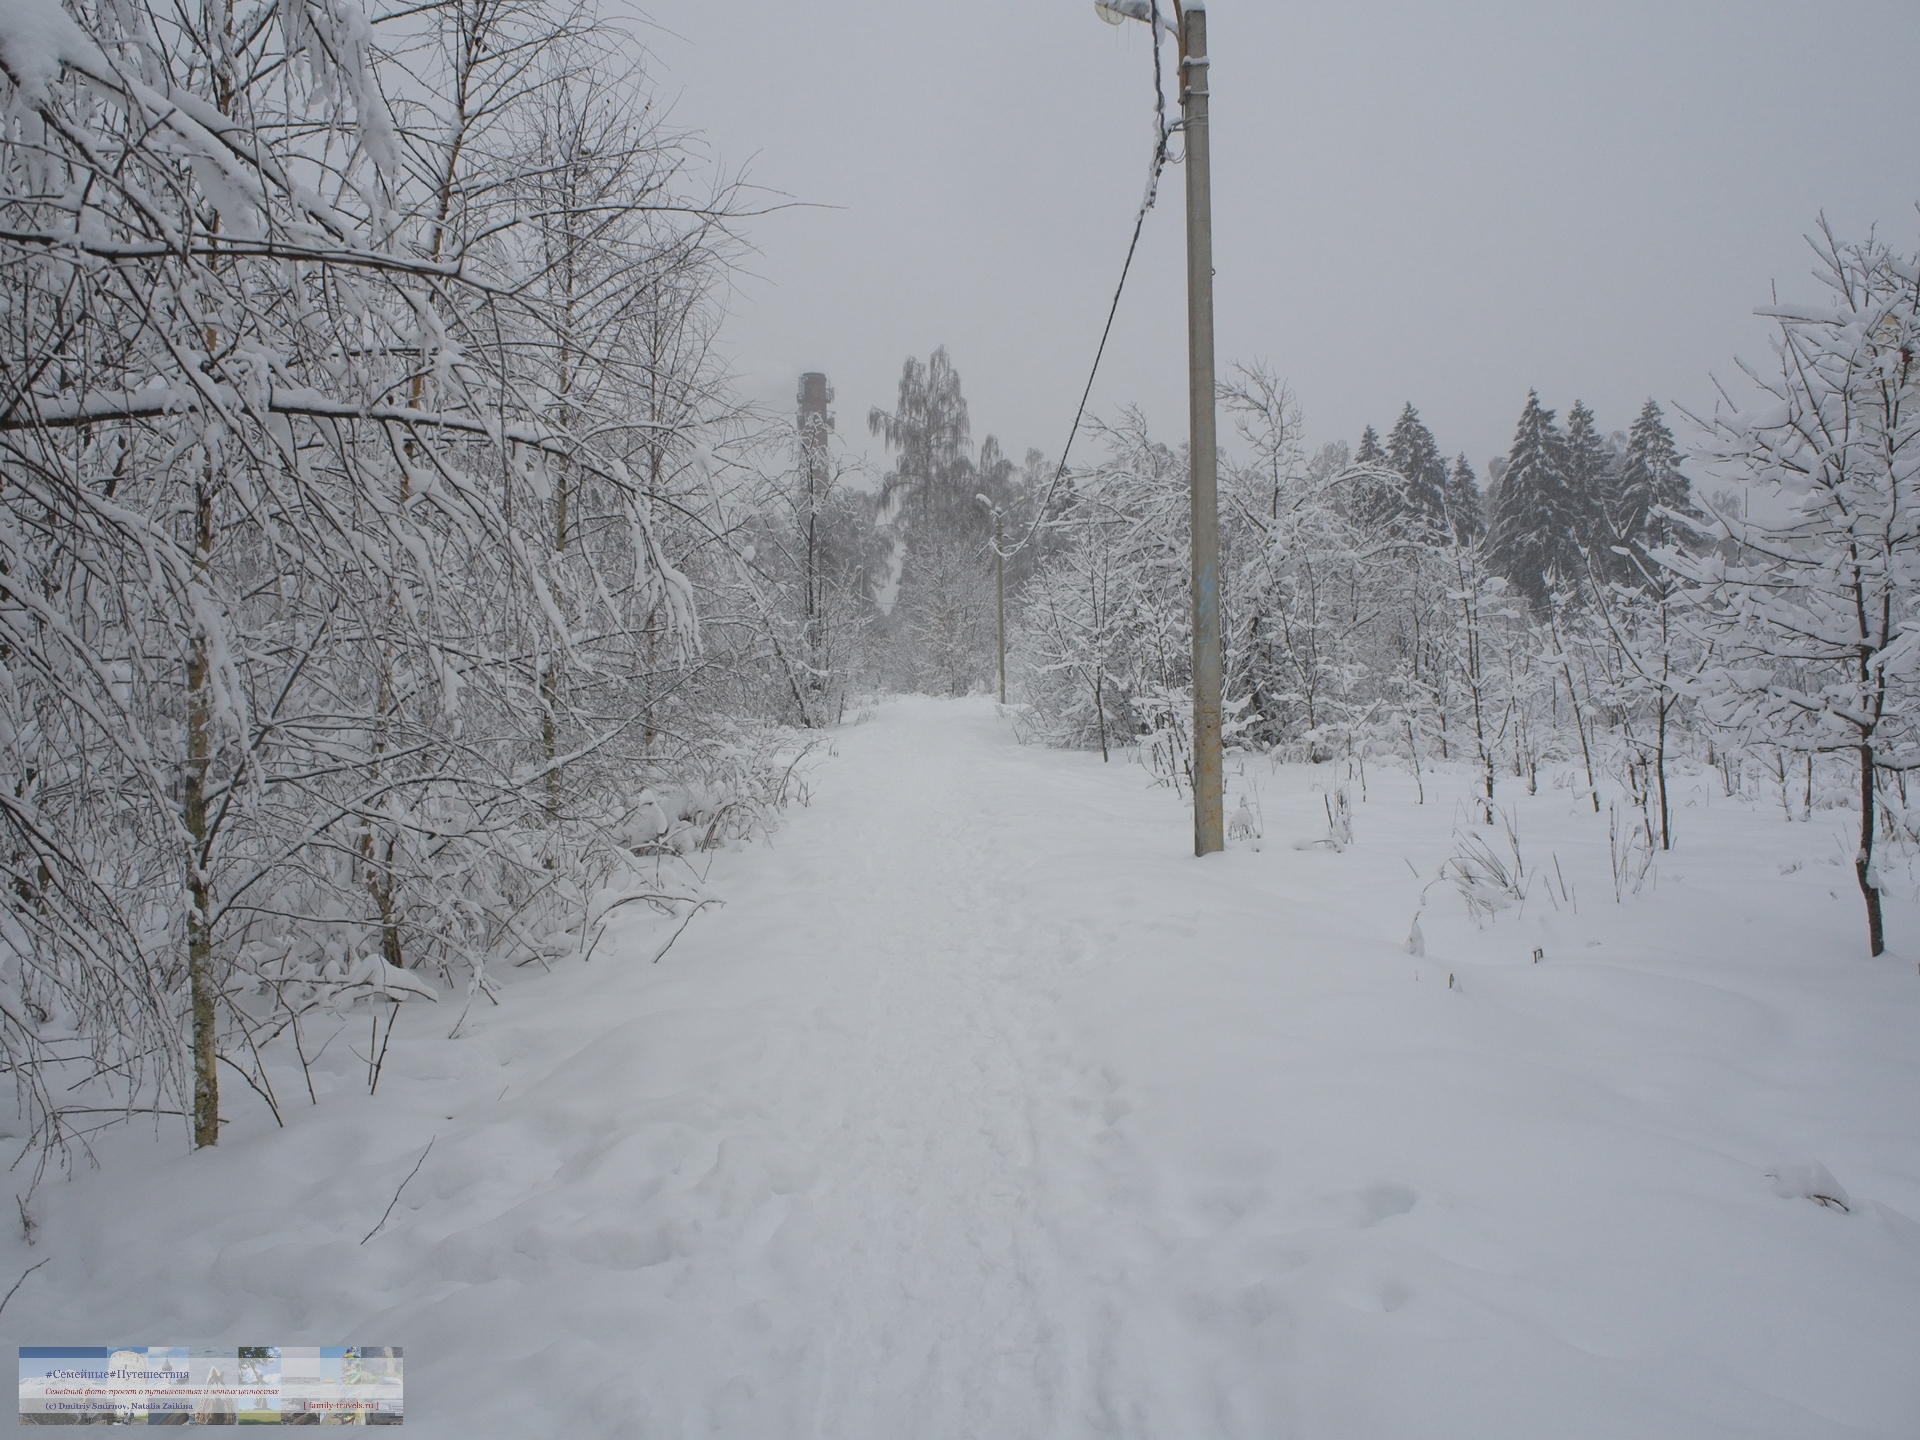 02042018-1441-Blog-032 Просто фото  Снегопад года